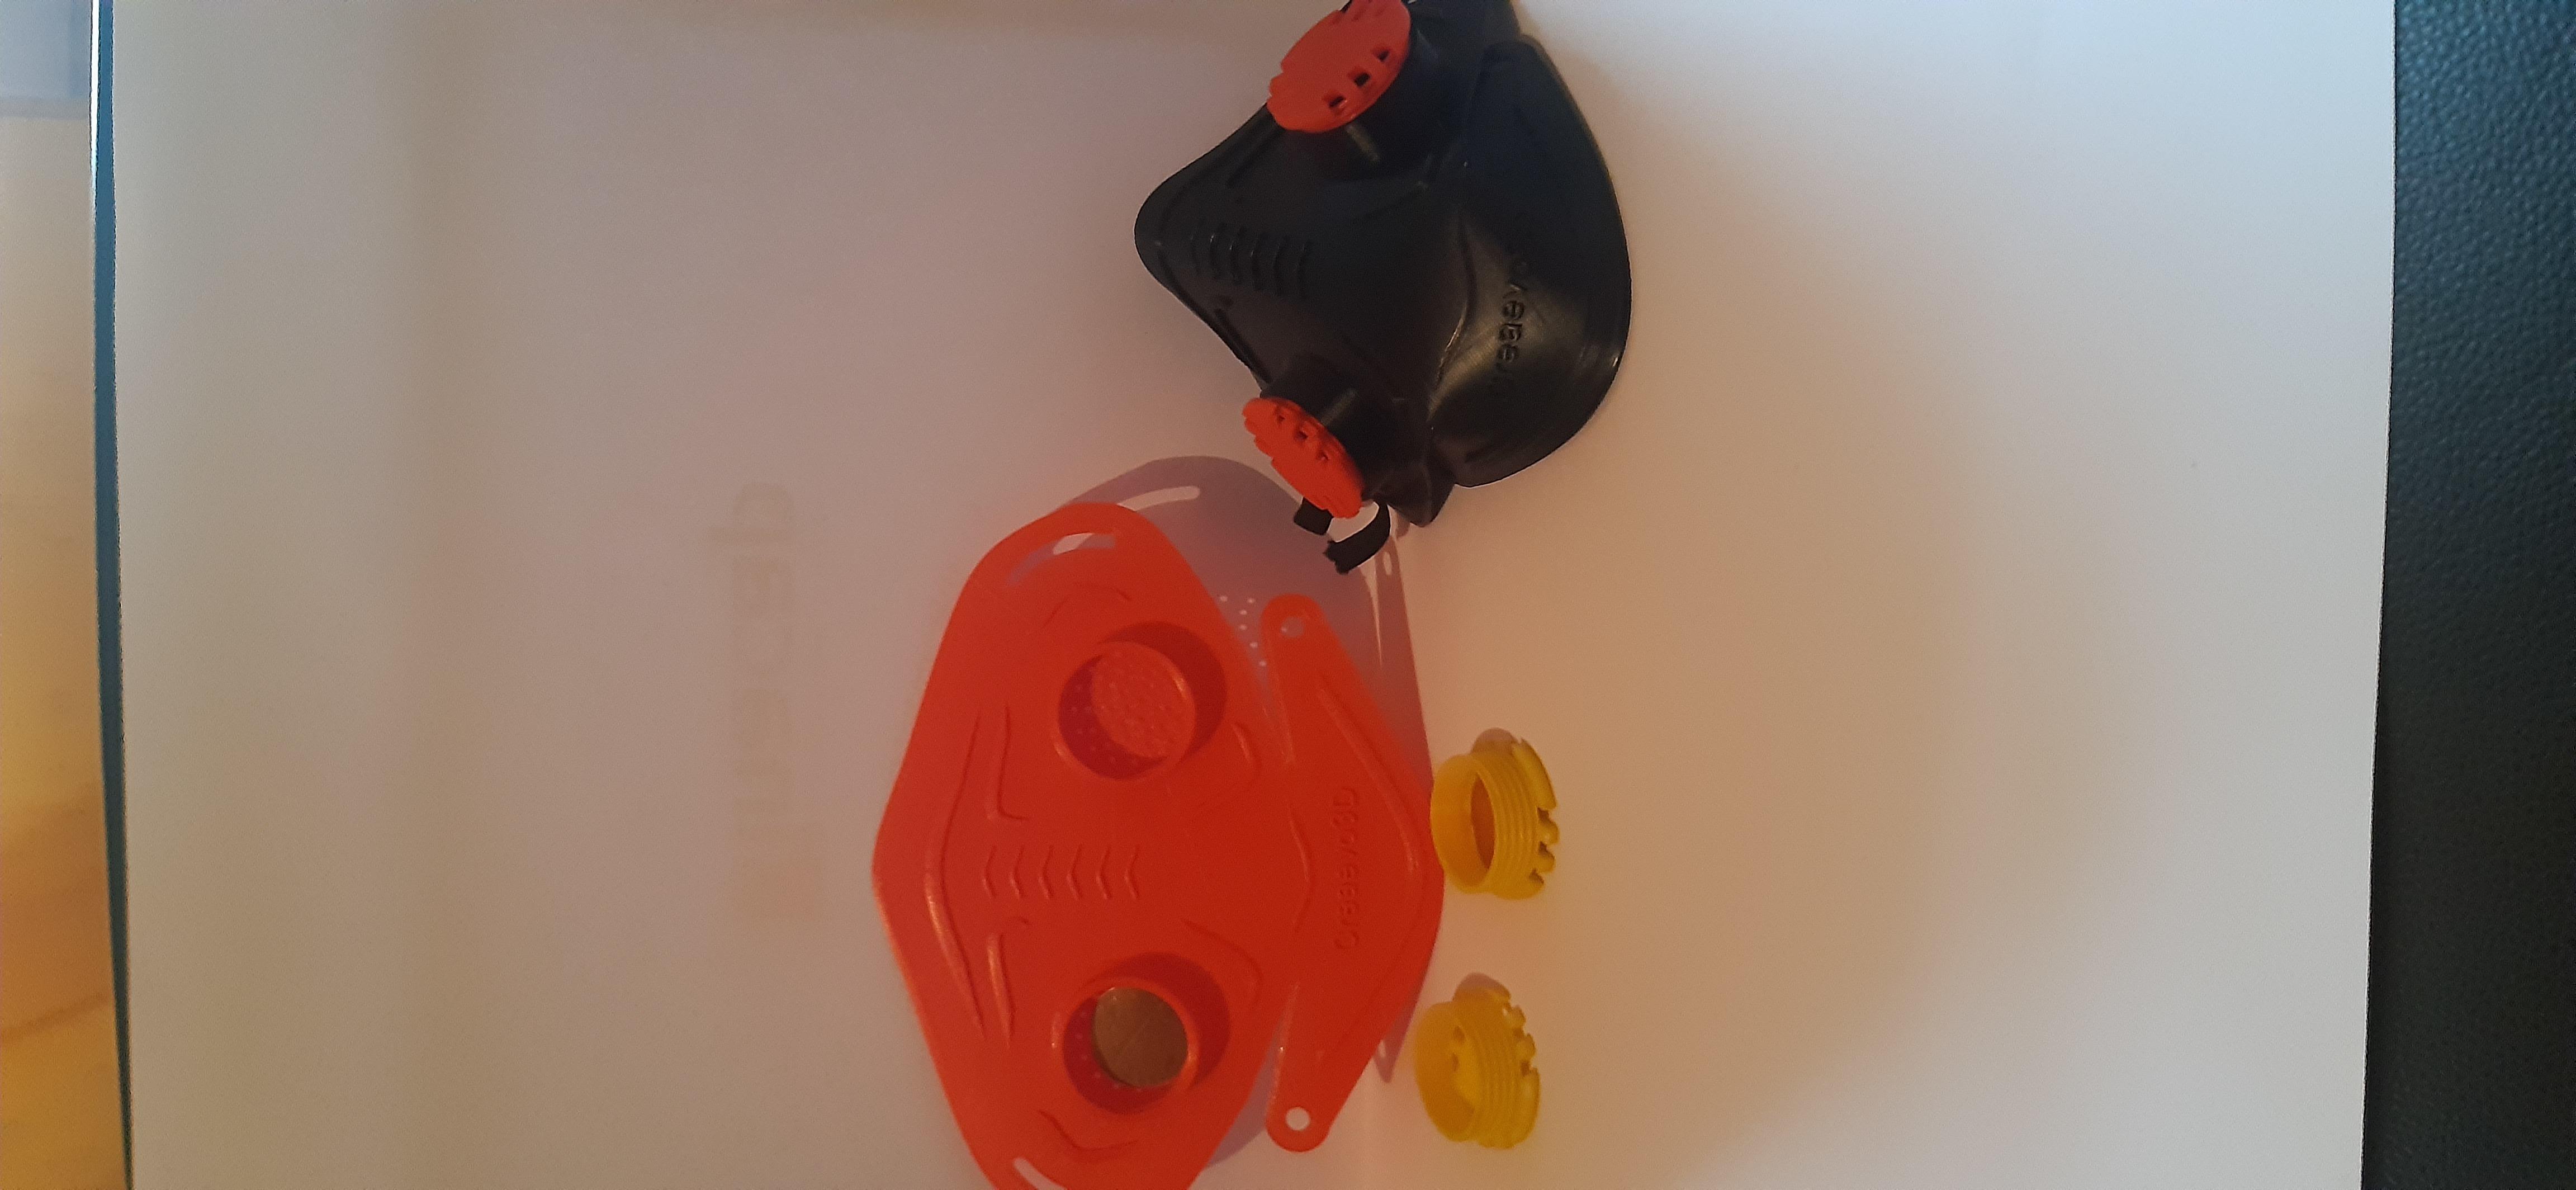 20200323_095234.jpg Download free STL file mask covid-19 • Model to 3D print, Creaevo3D